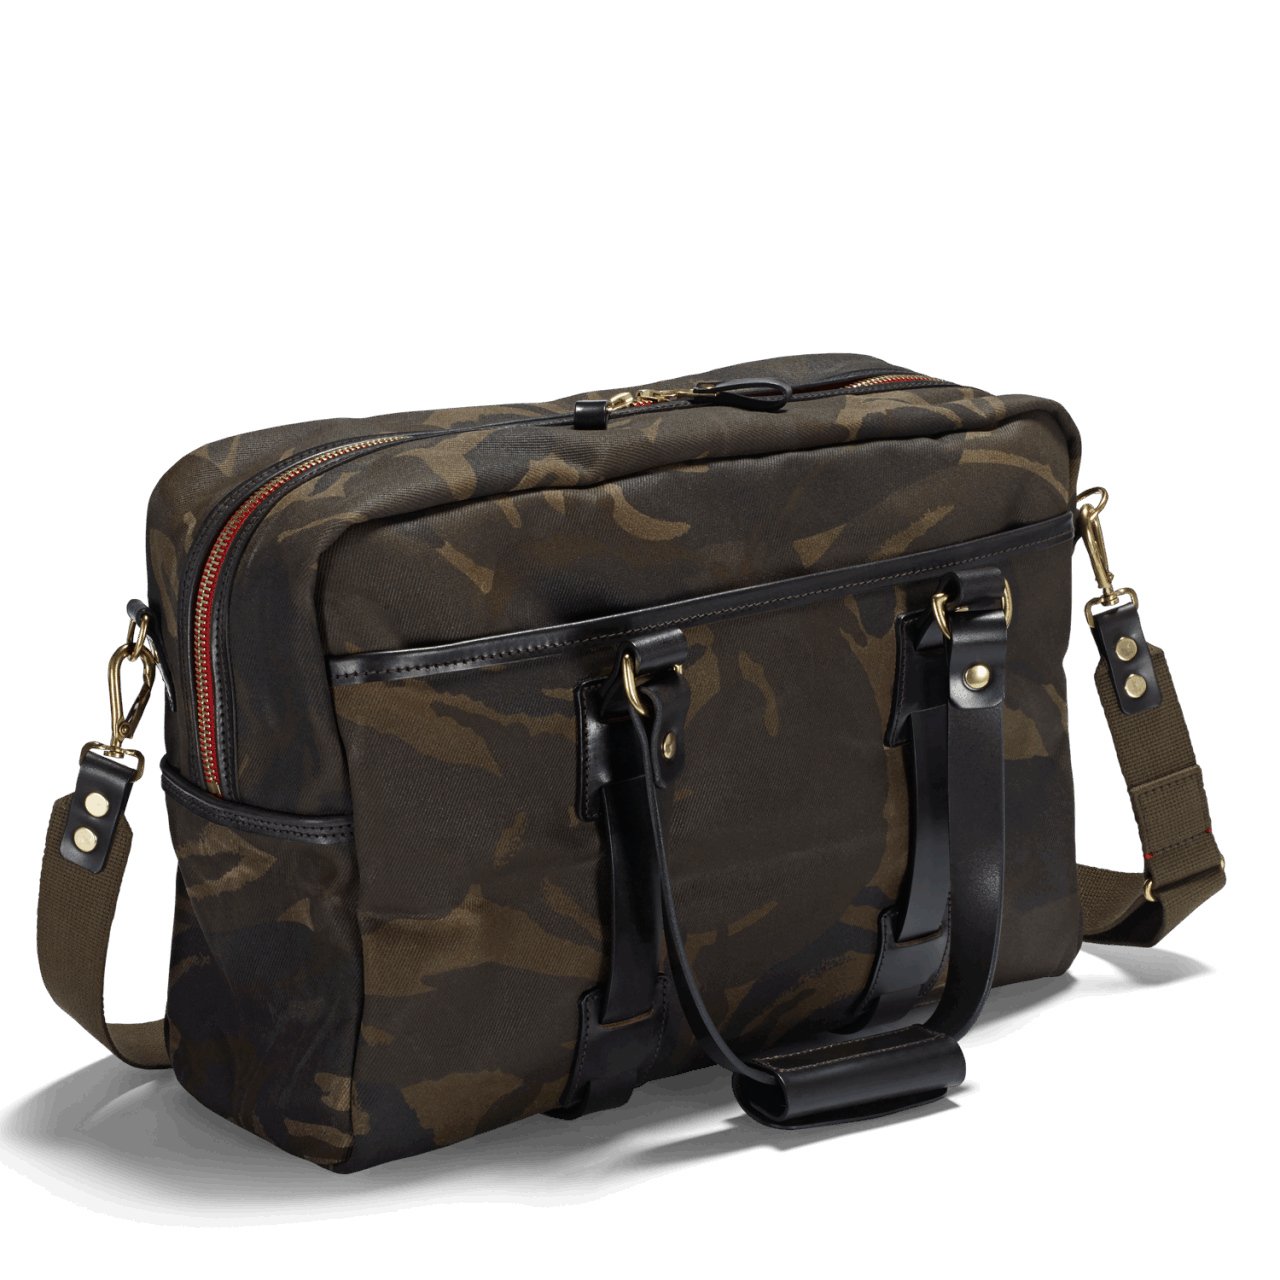 Croots Waxed Camo Traveller Bag